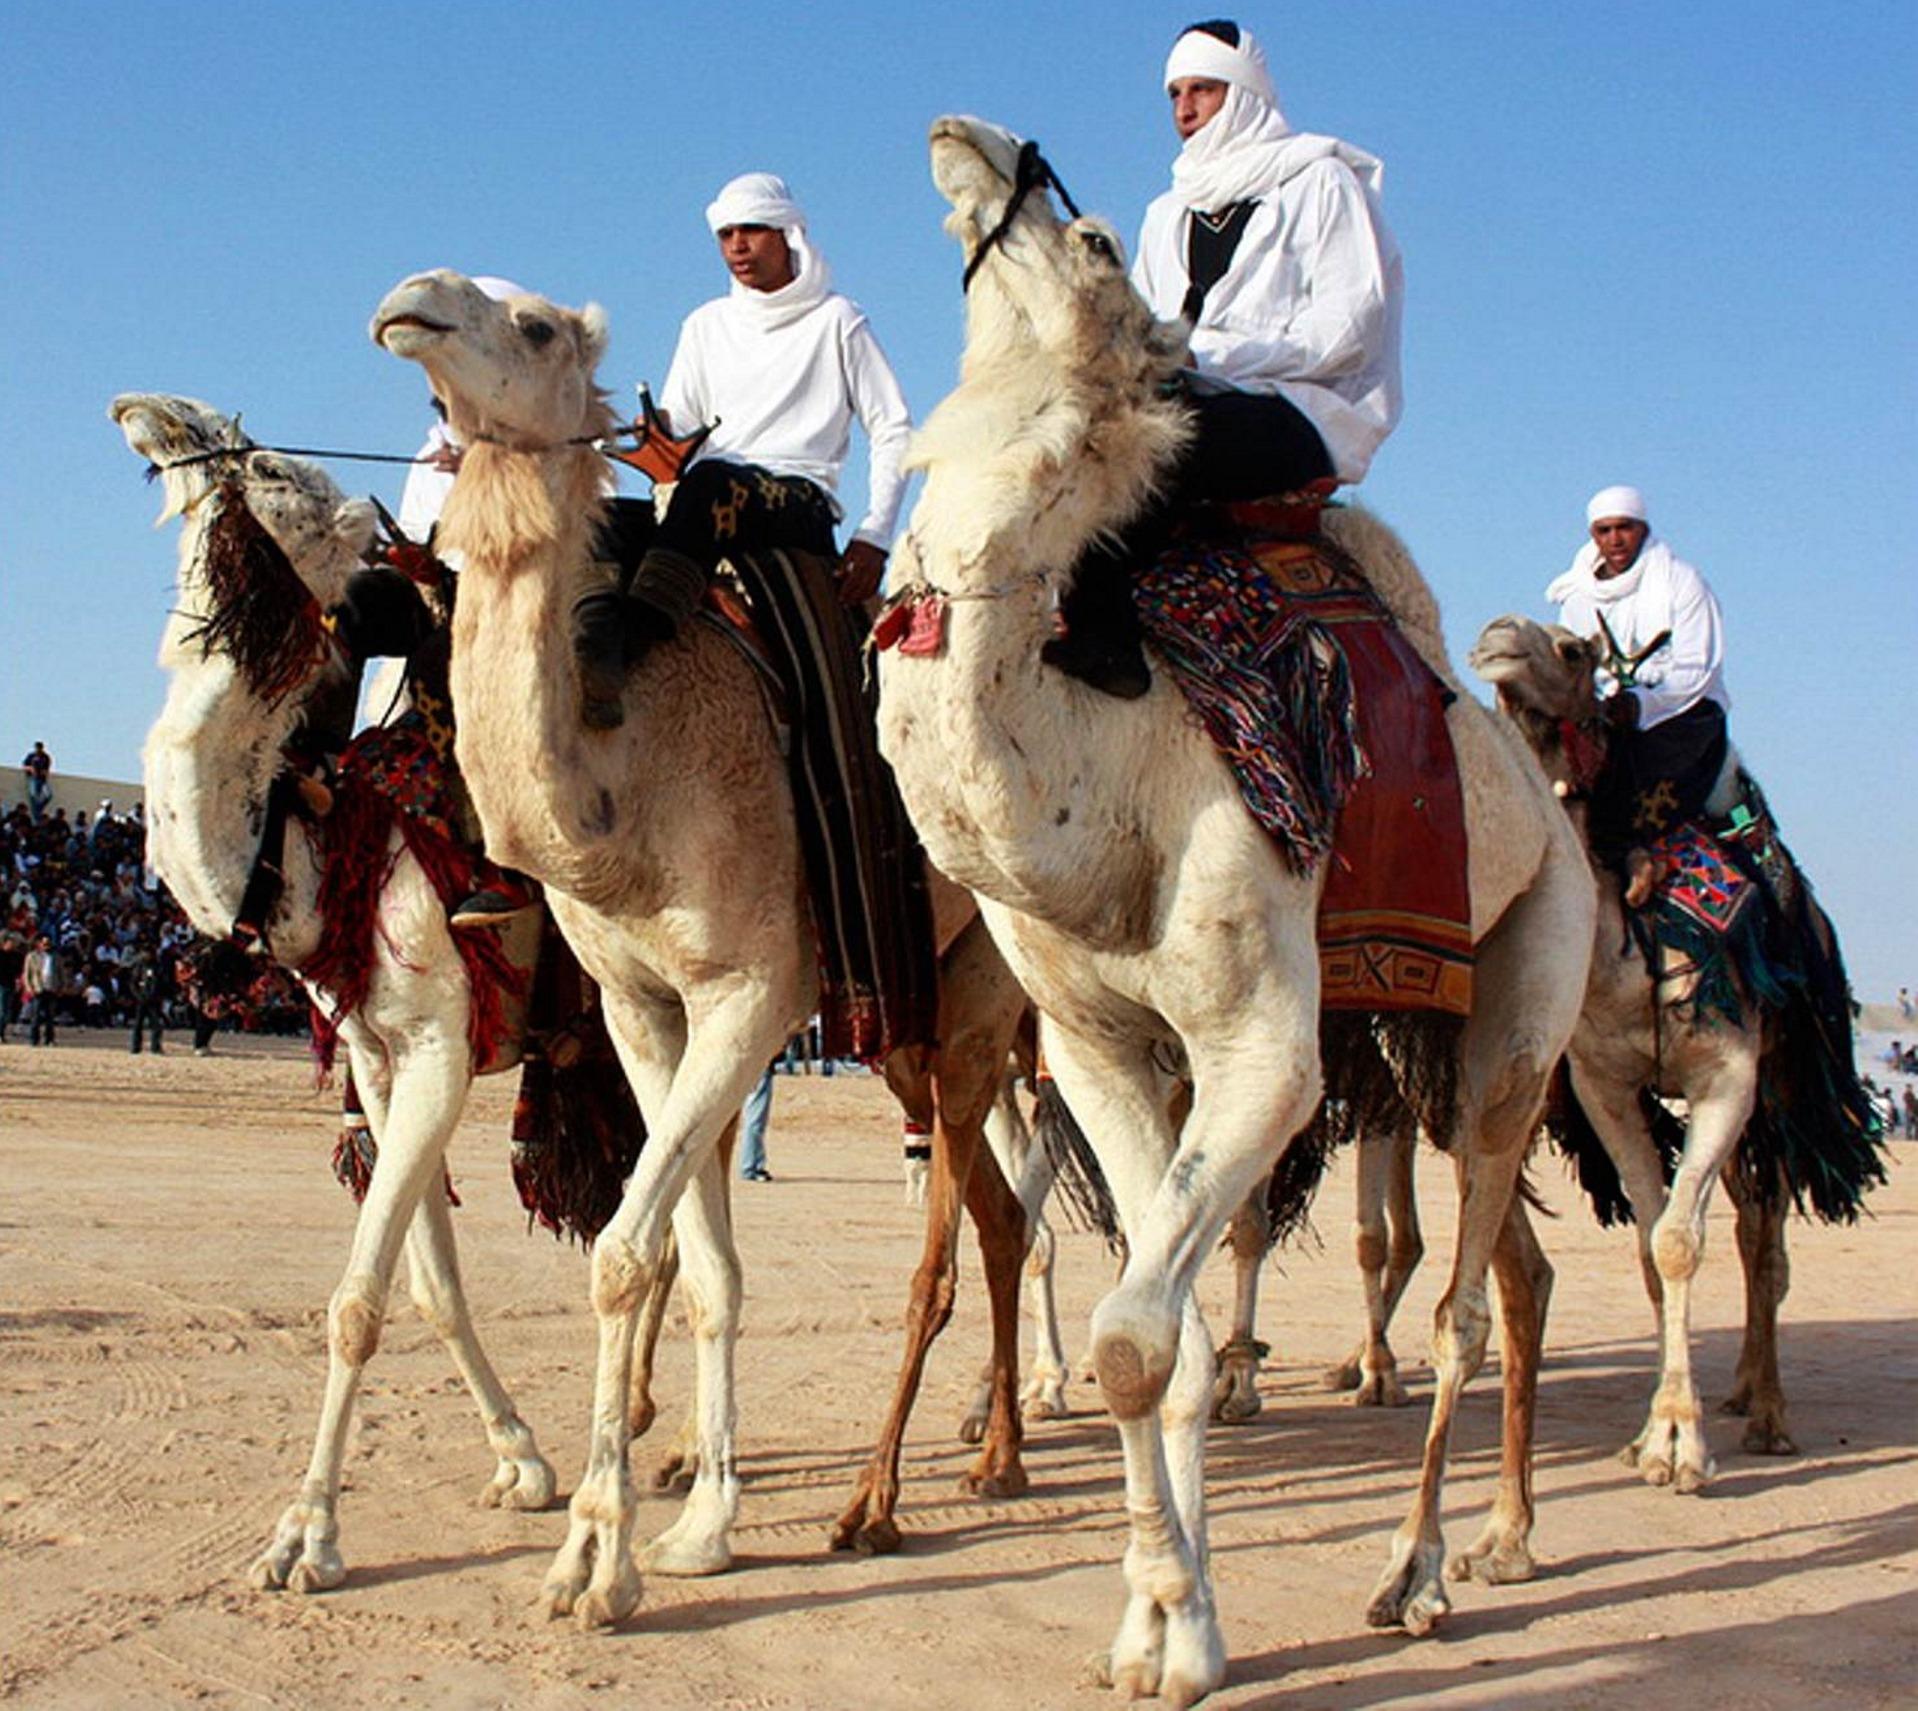 International Festival of the Sahara - hammamet guide - Globetrotting horse riding holidays